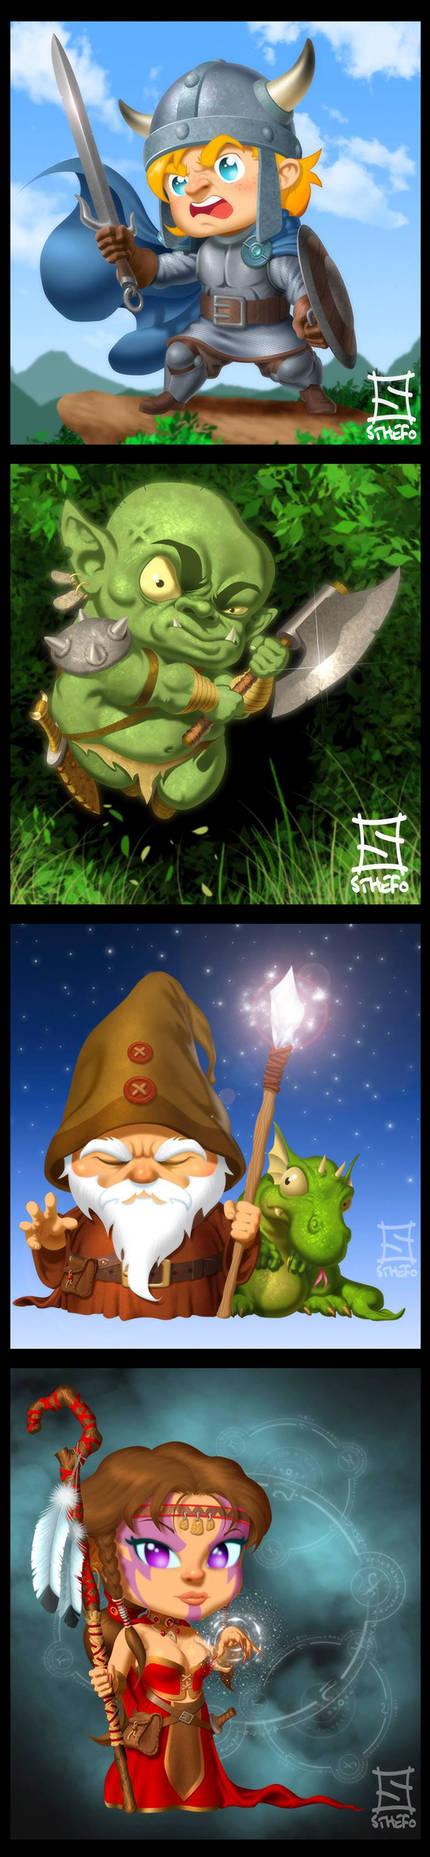 Fantasy Chibi